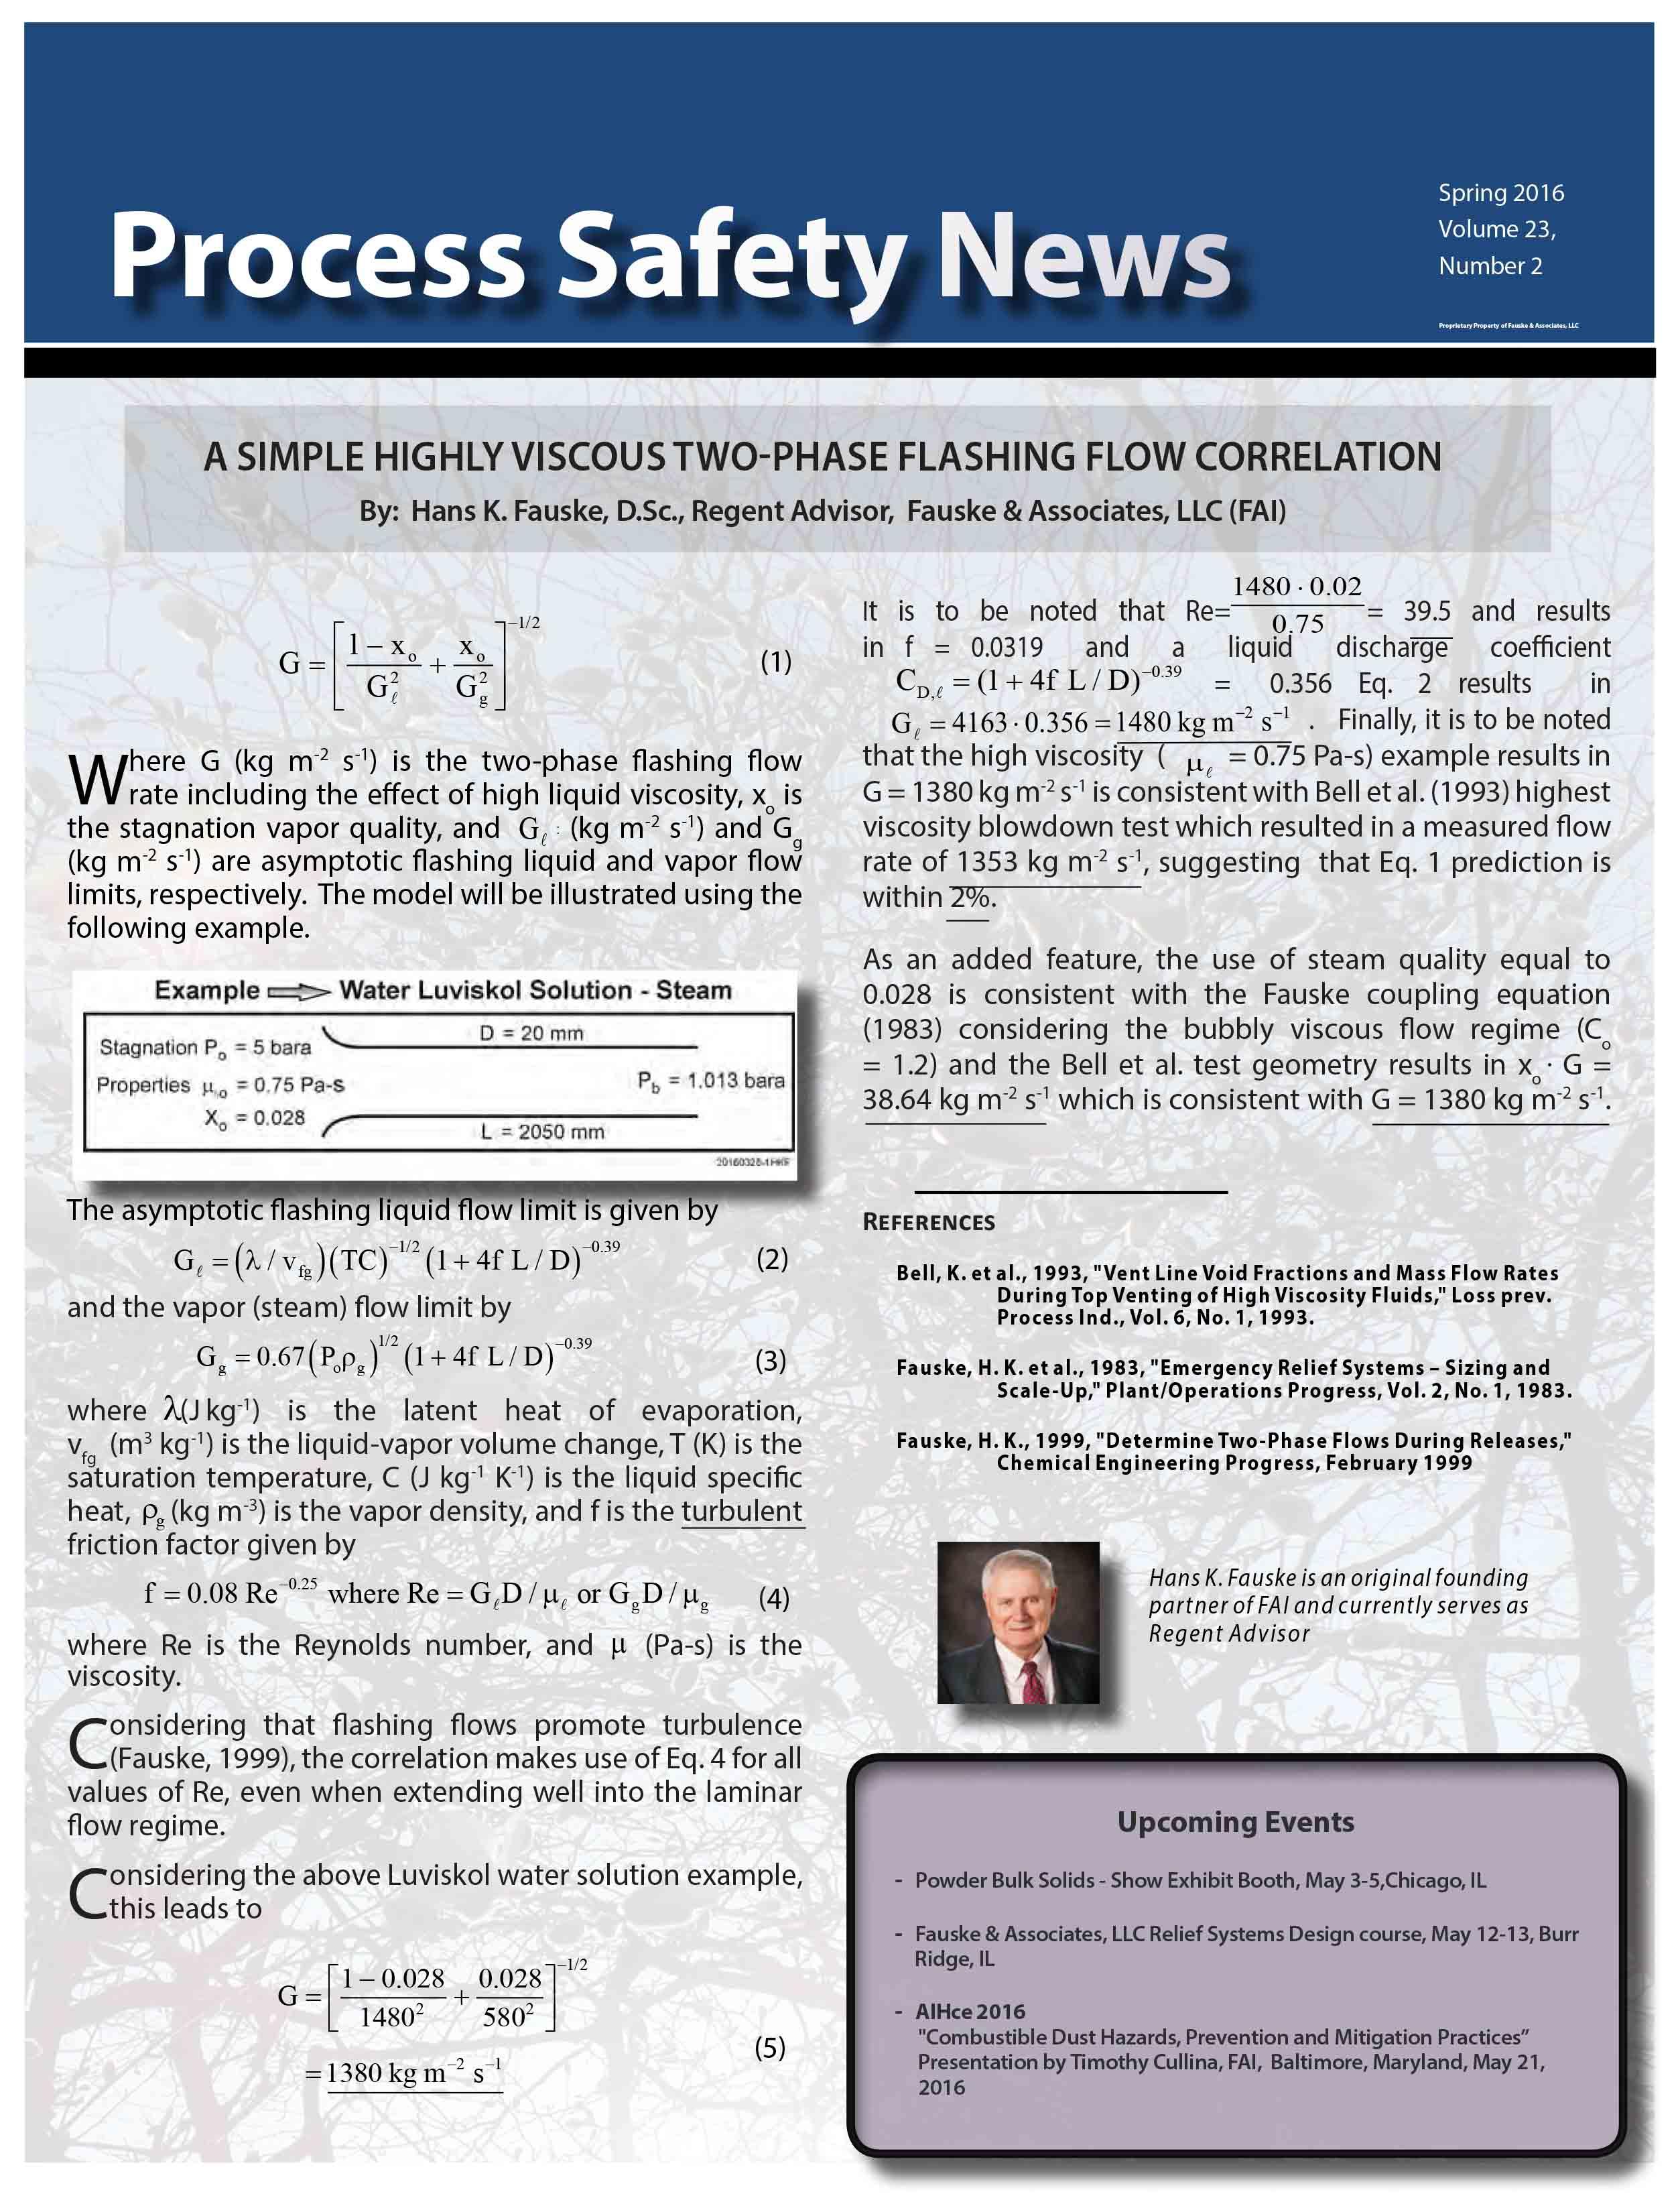 Process_Safety_News_Spring_2016_-FULLweb-1.jpg